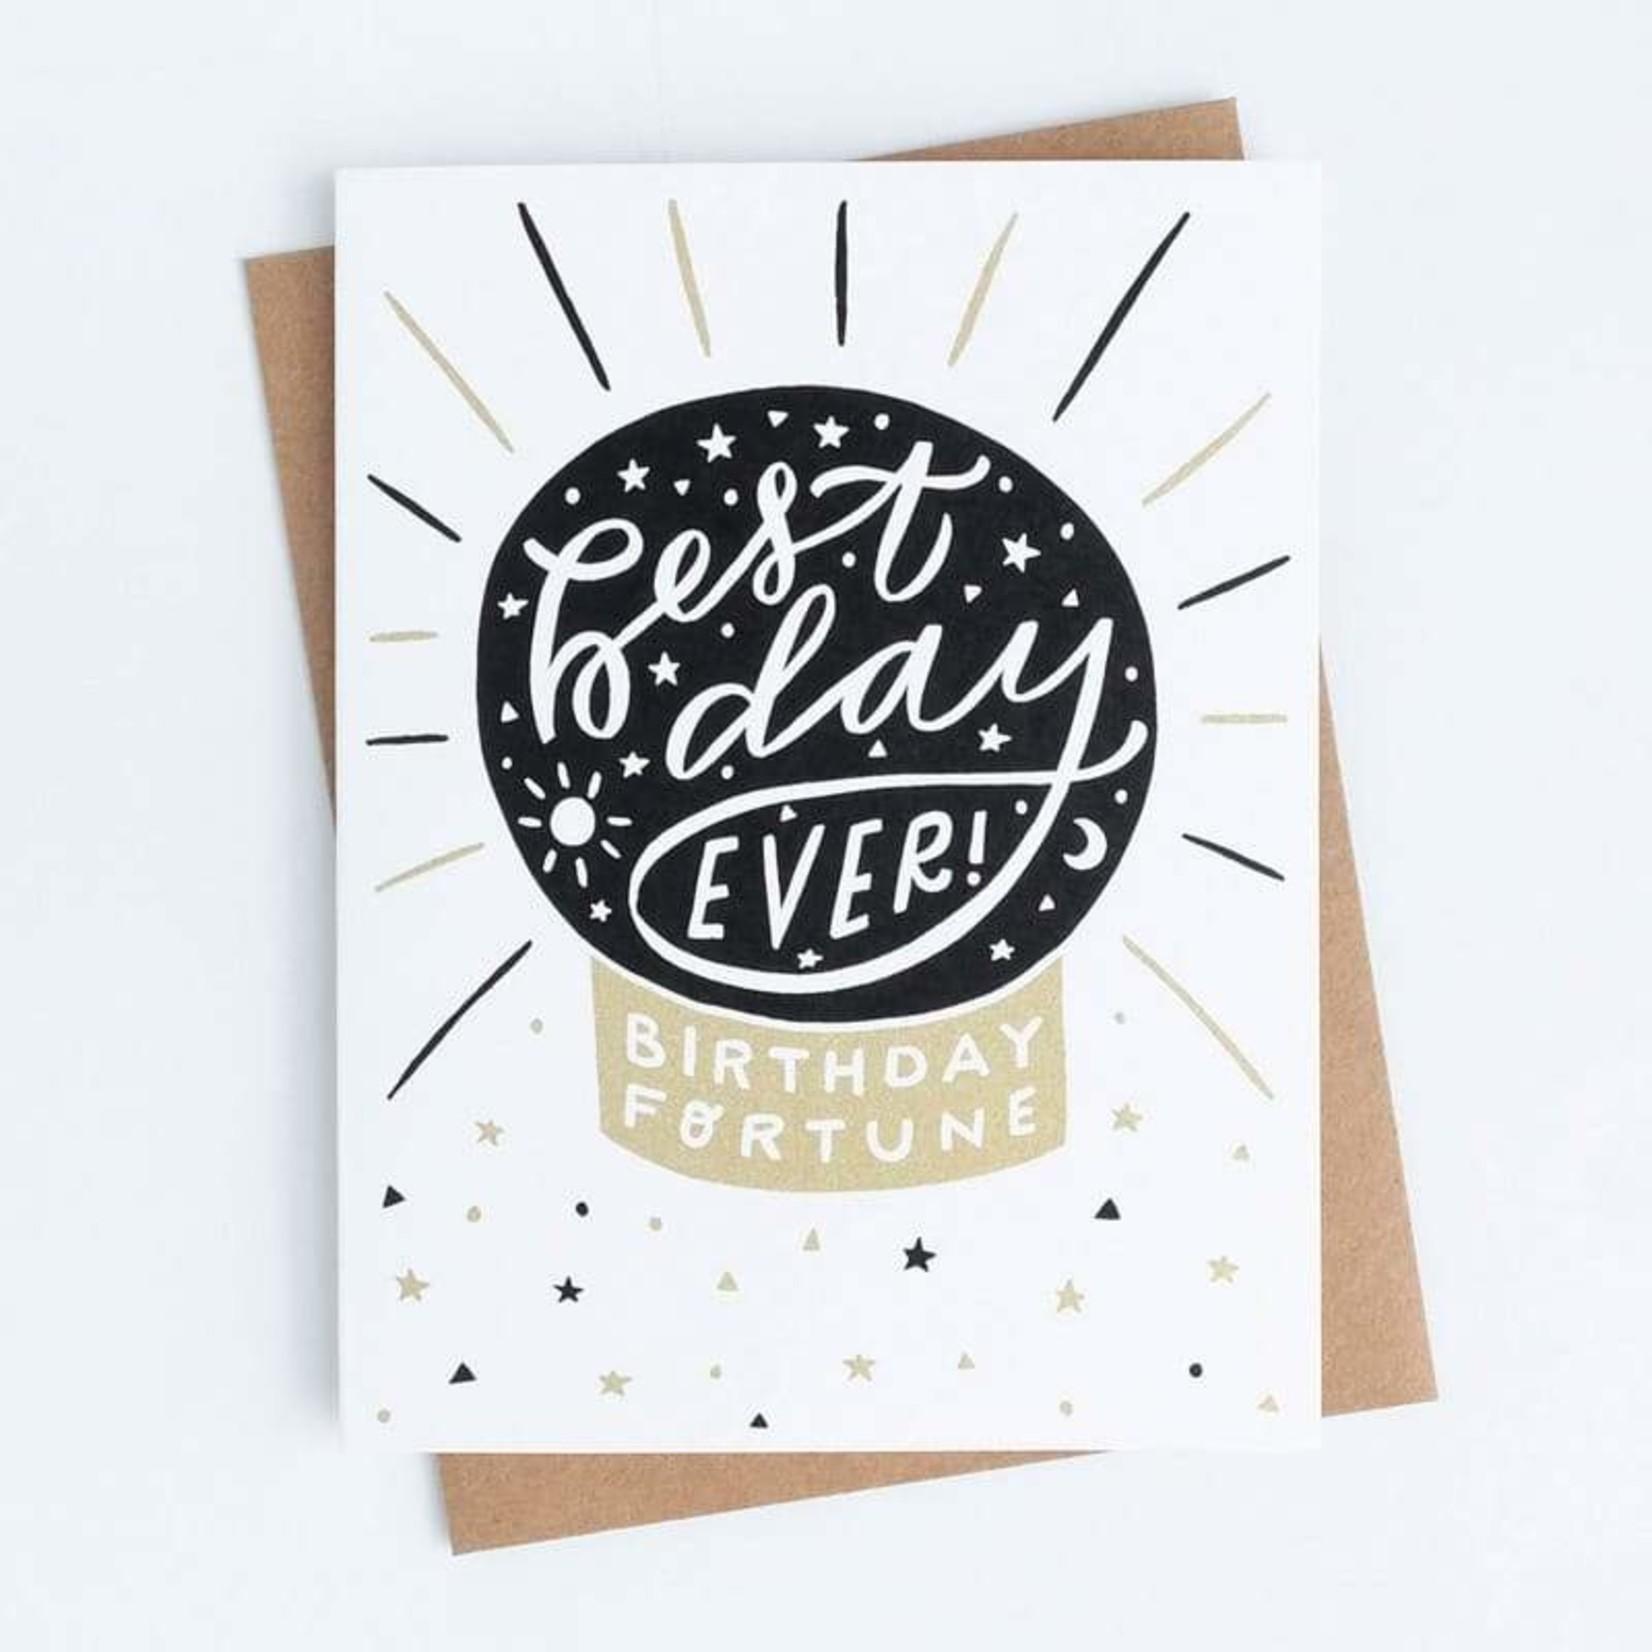 Birthday Card: Best Day Ever!